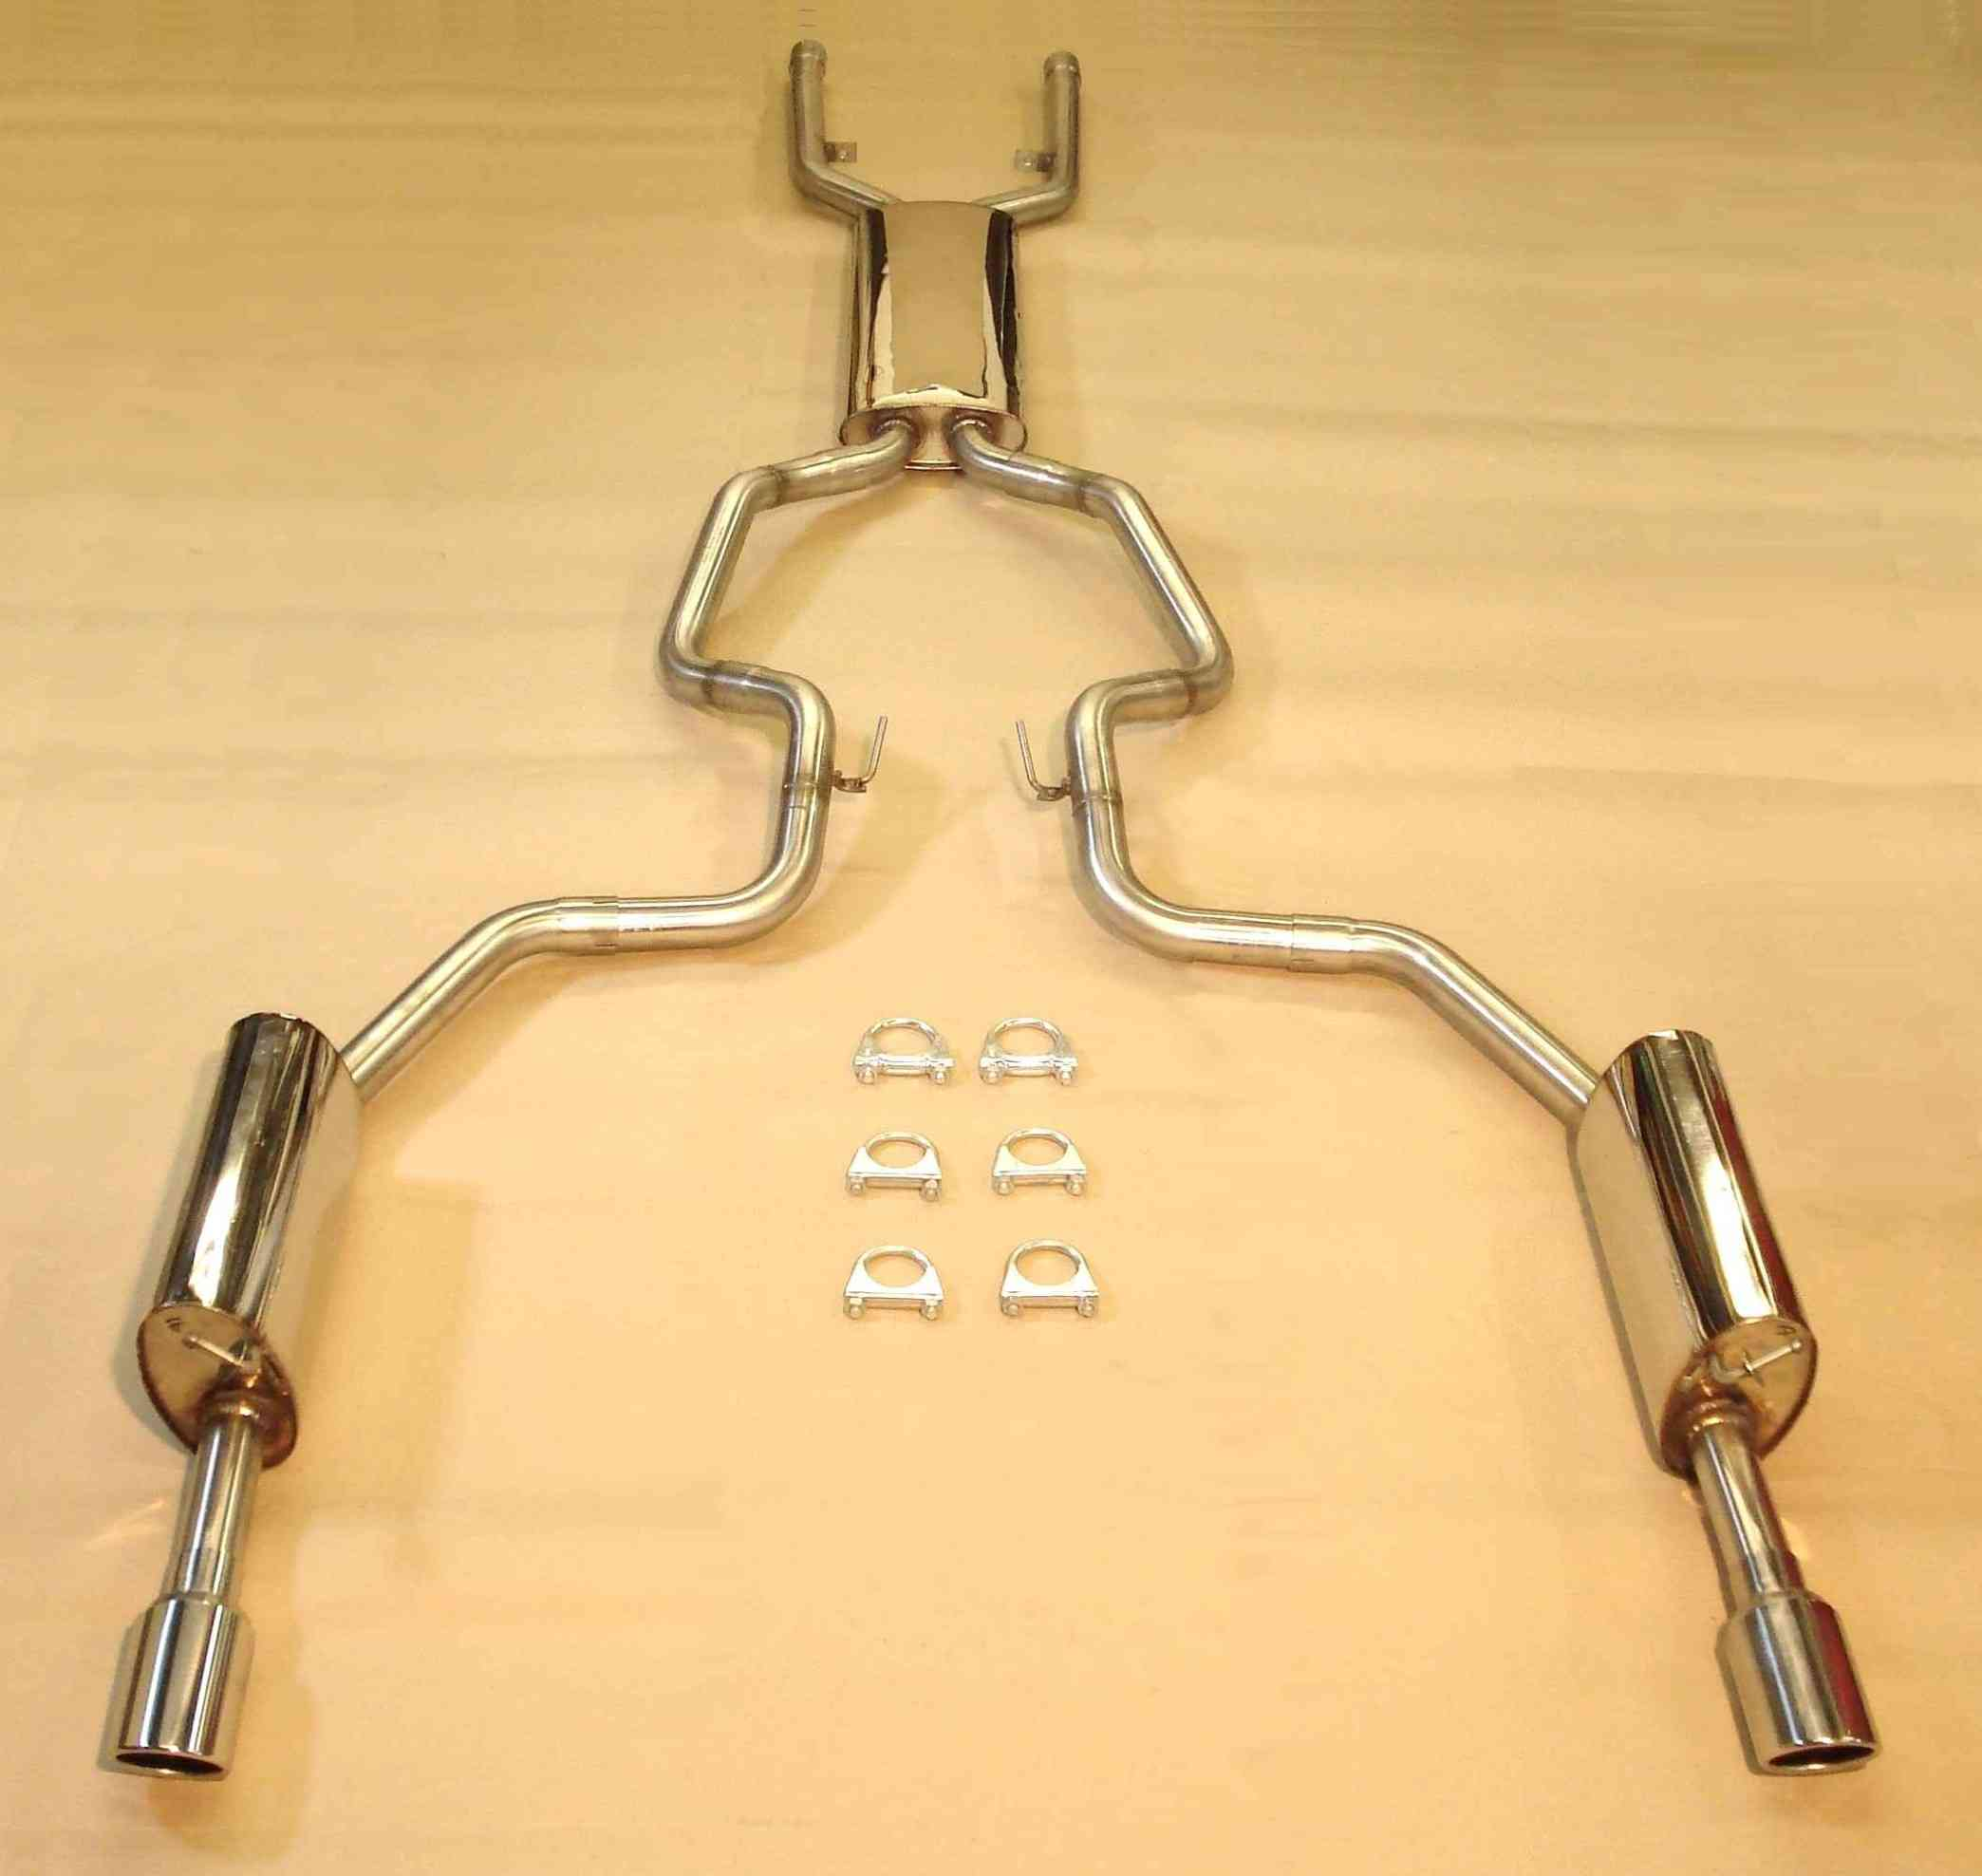 XK8 Performance system